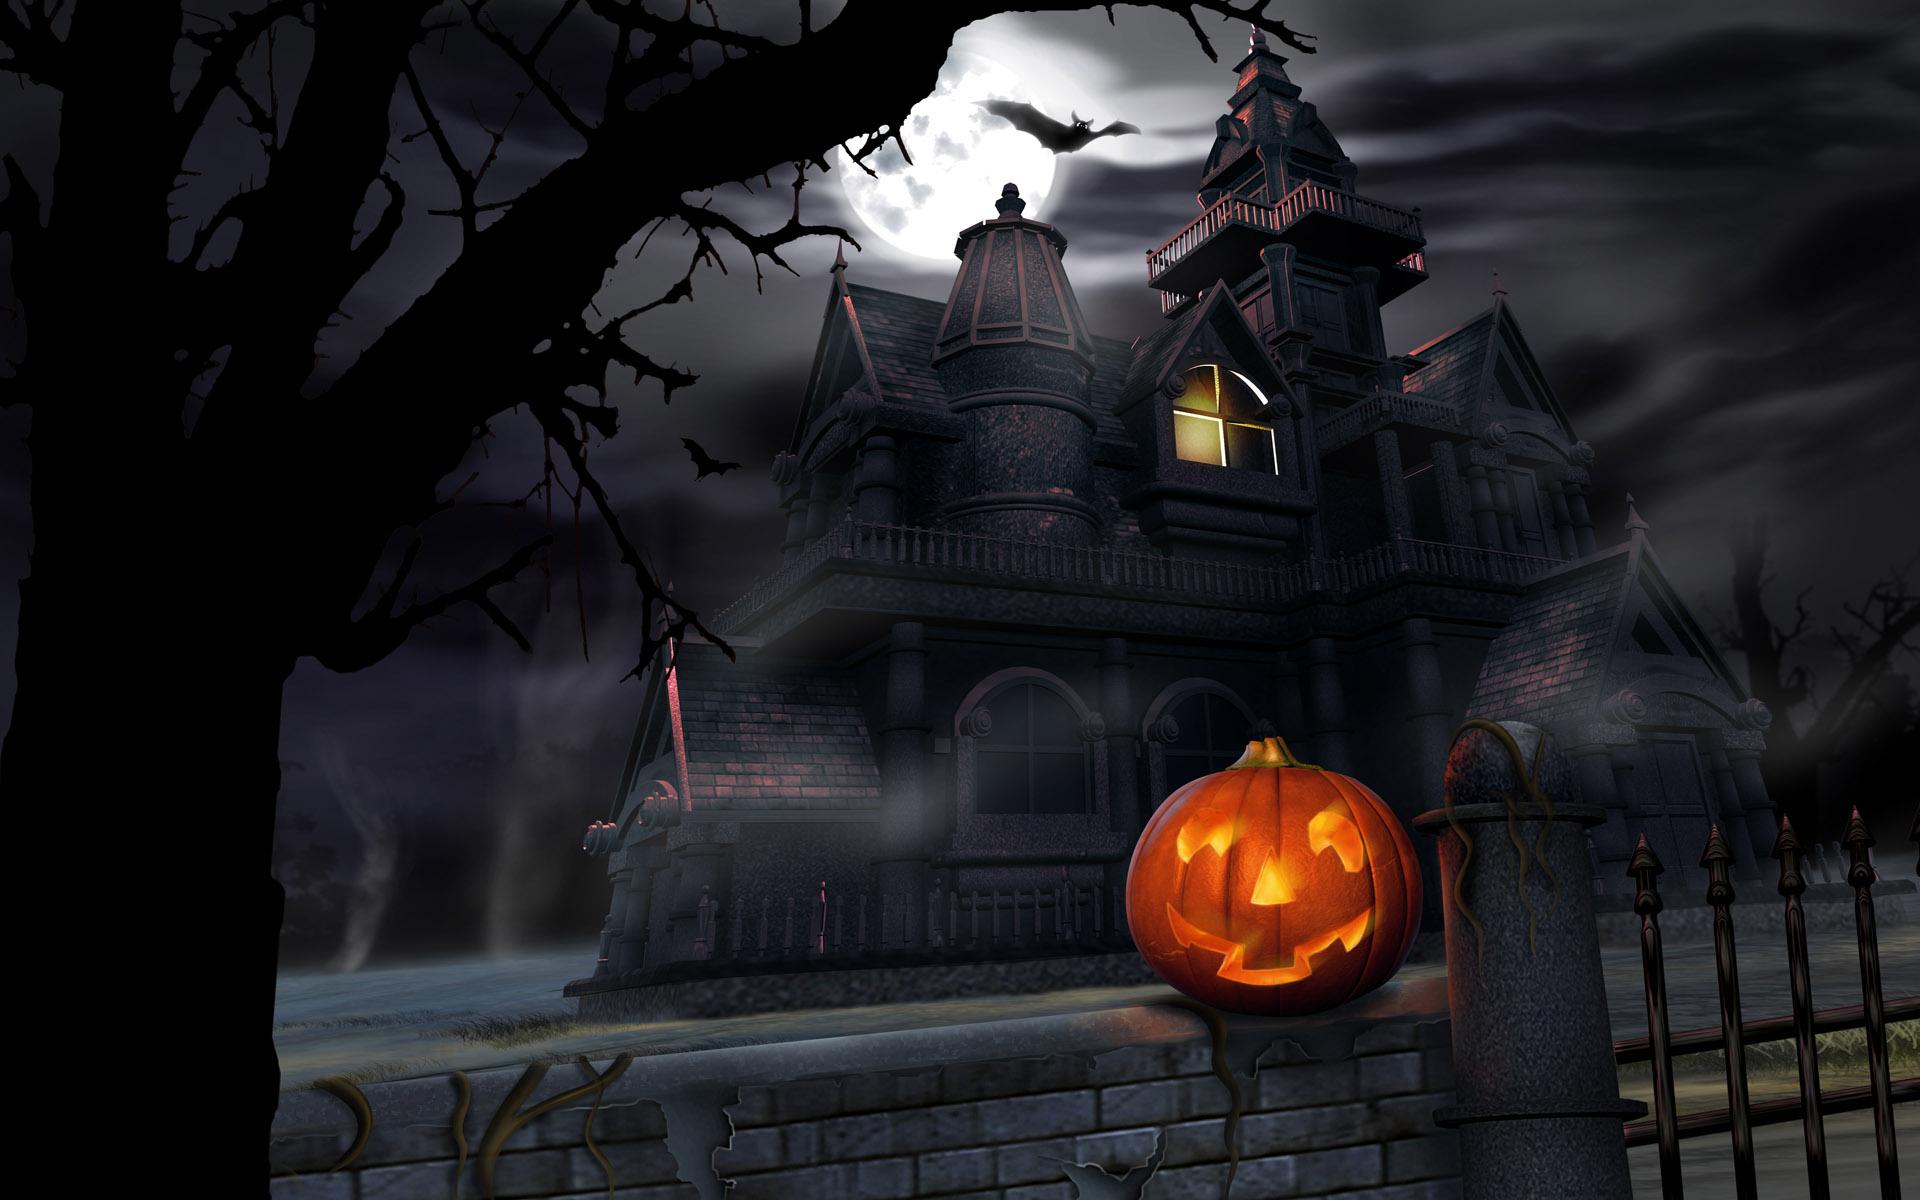 Scary Halloween 2012 Graveyard HD Wallpaper